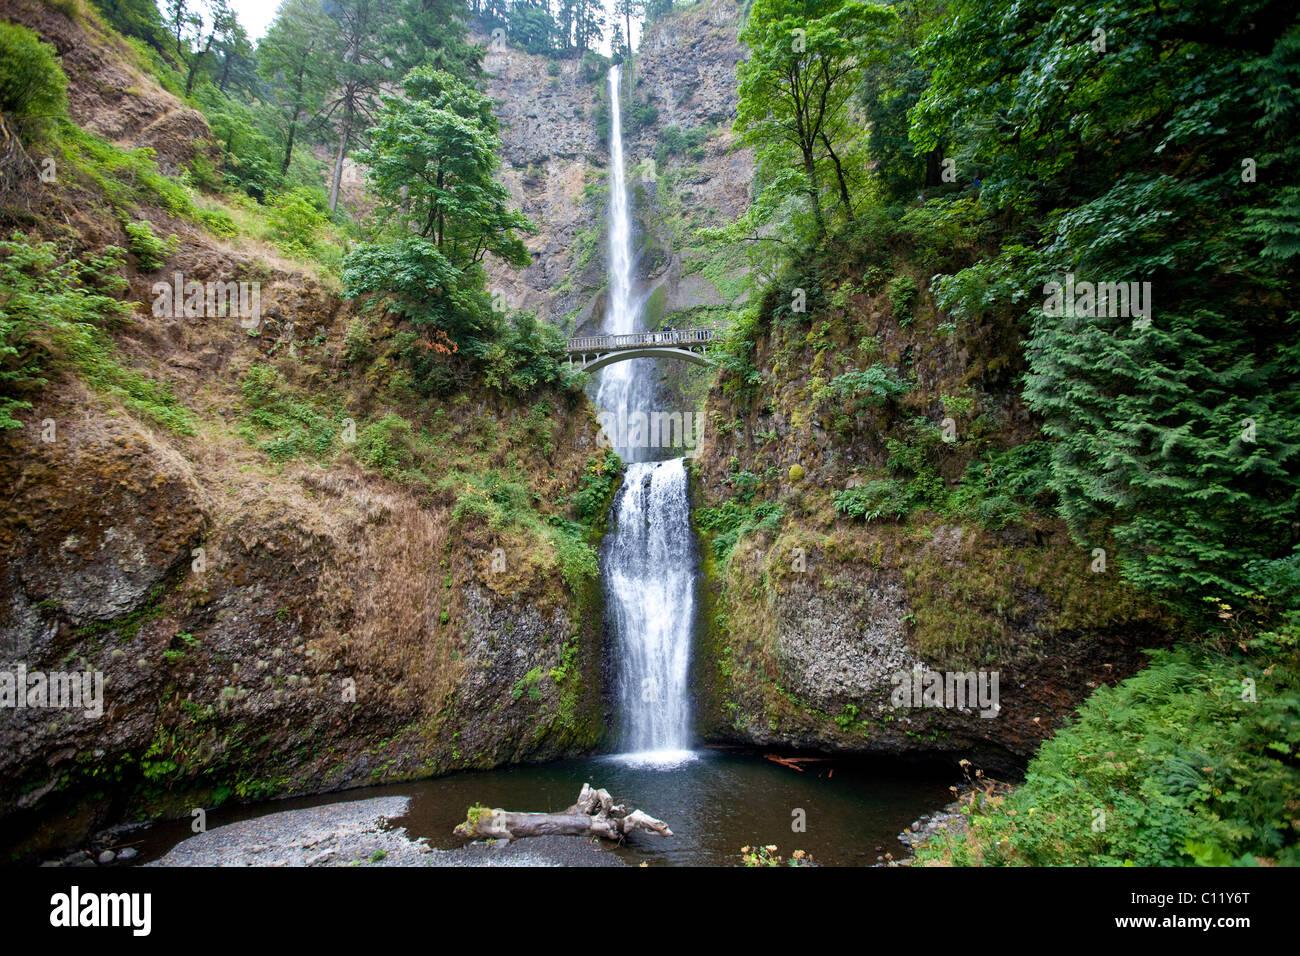 multnomah falls columbia river gorge cascade range oregon usa stock photo royalty free. Black Bedroom Furniture Sets. Home Design Ideas